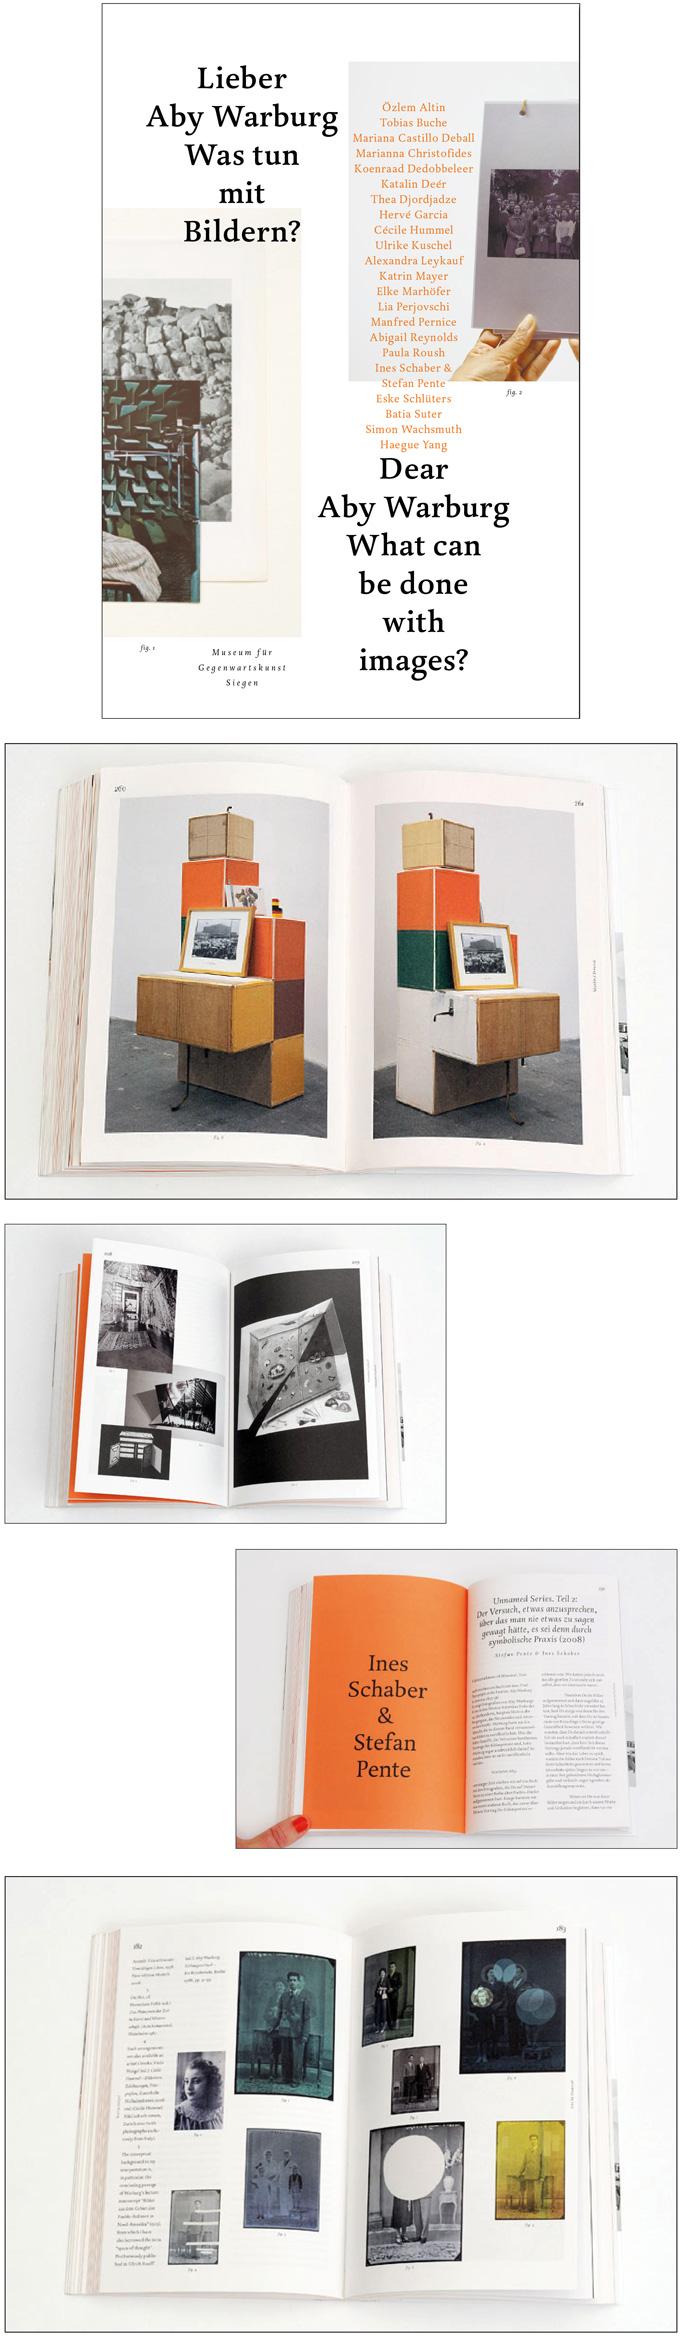 warburg_lavoila_catalogue